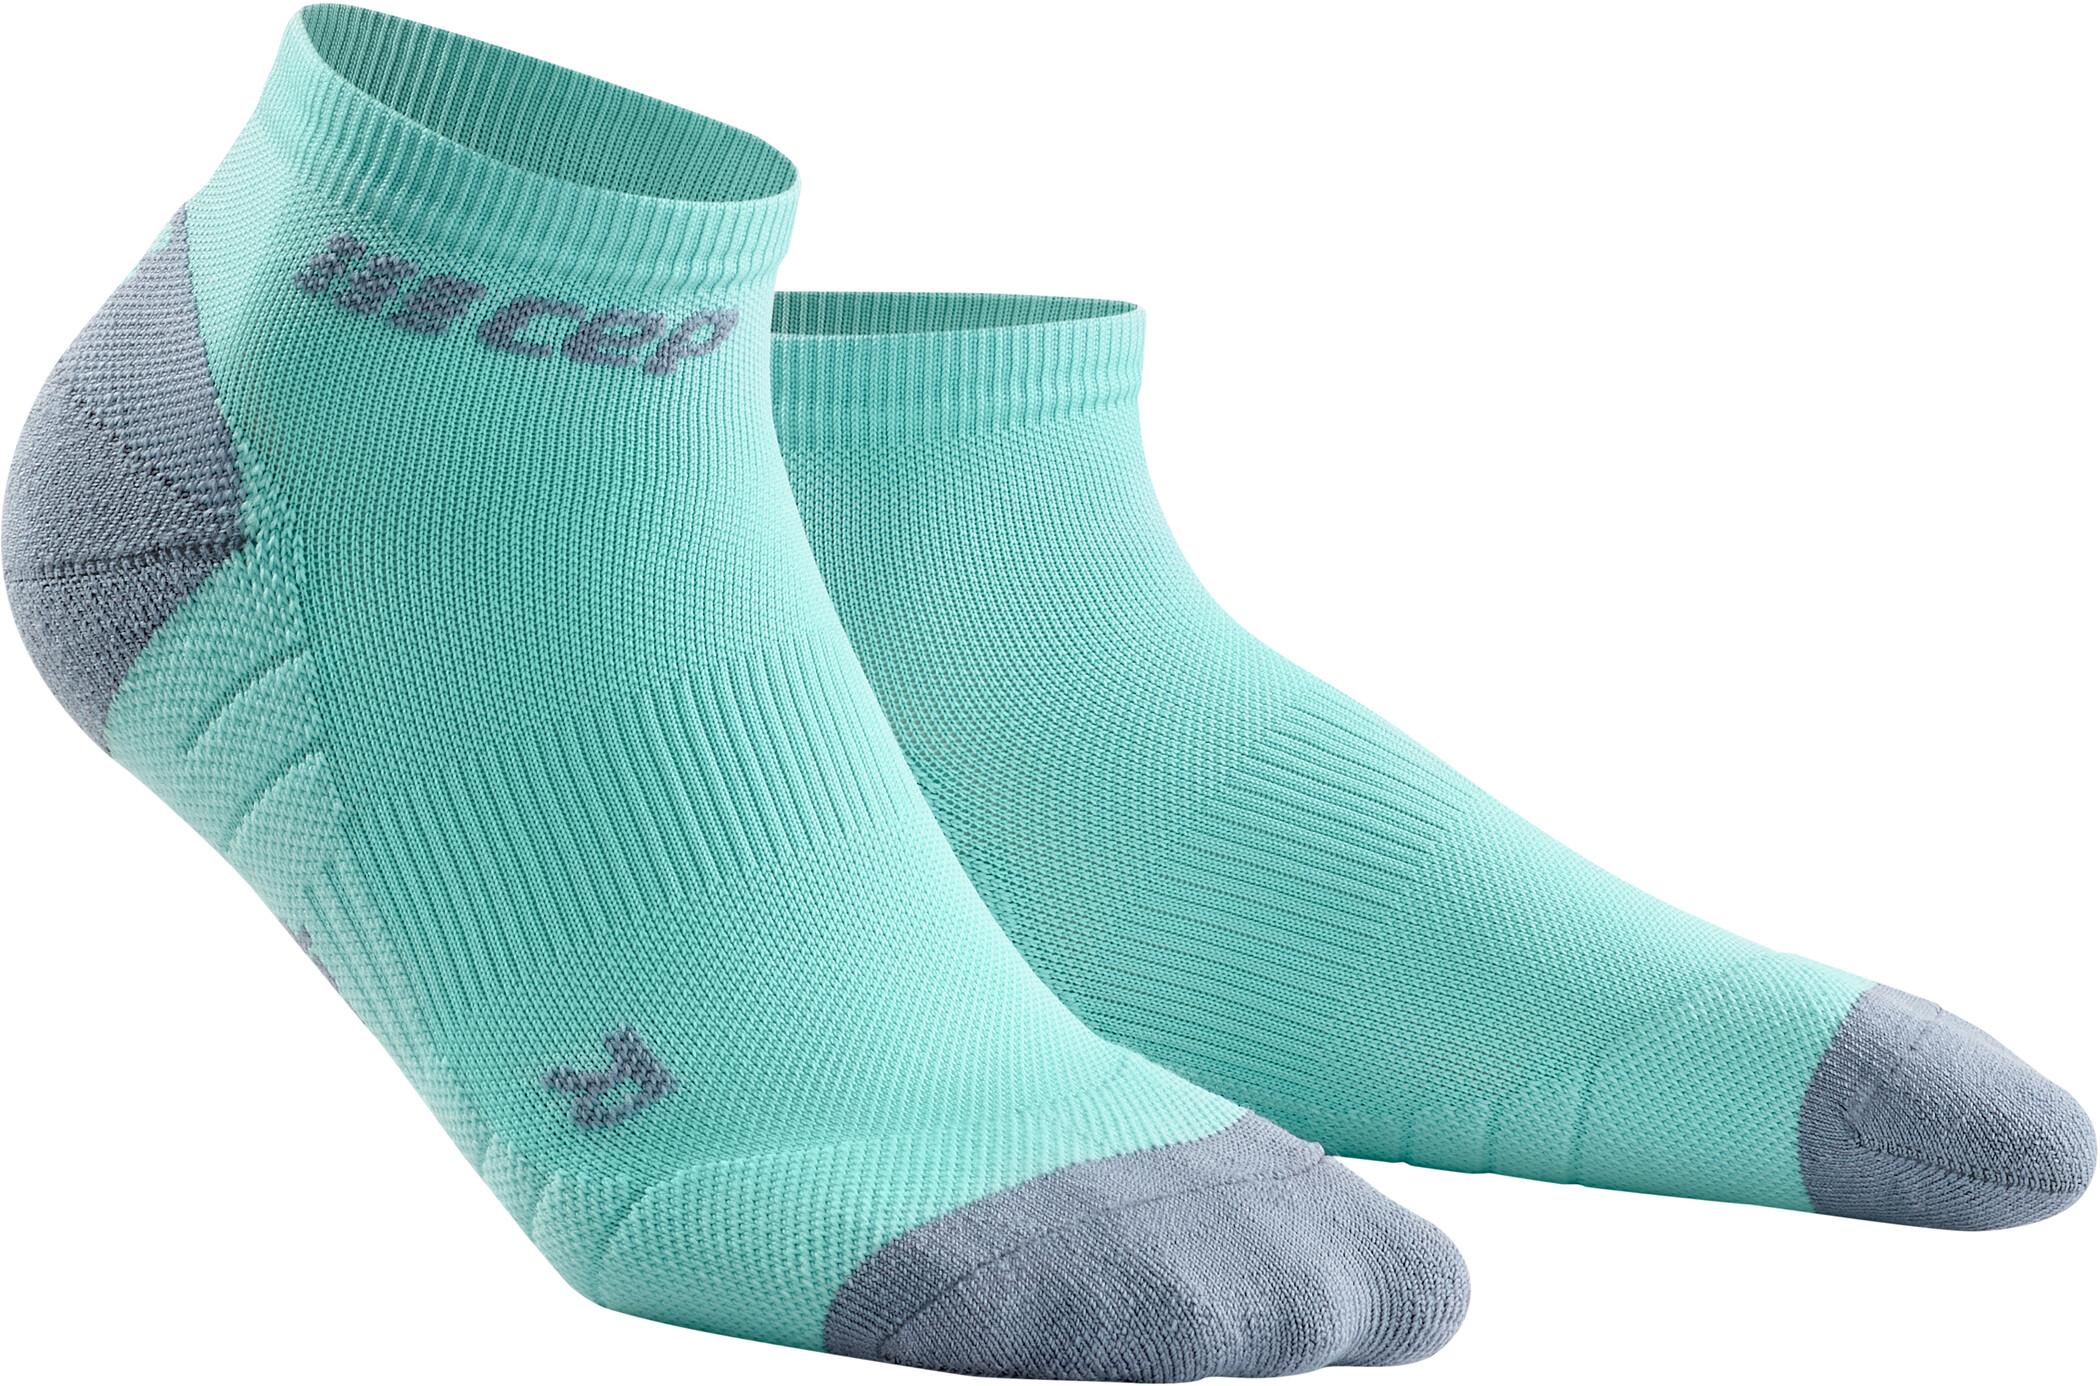 Run Socks 3.0 Damer, turkis/grå | cykelstrømpe